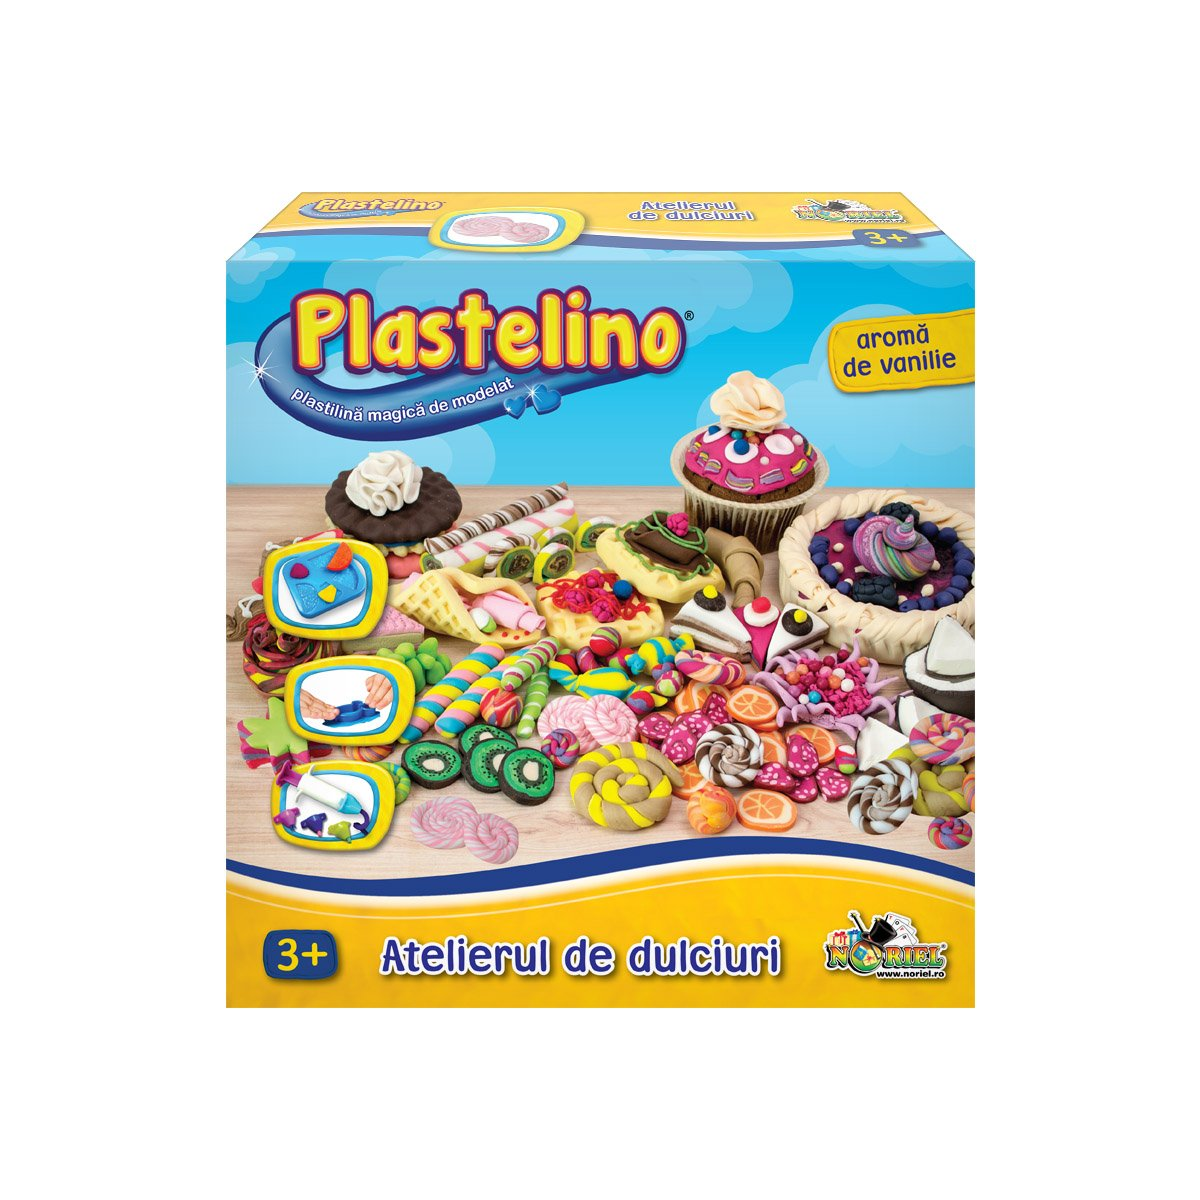 Plastelino - Atelierul de dulciuri din plastilina II imagine